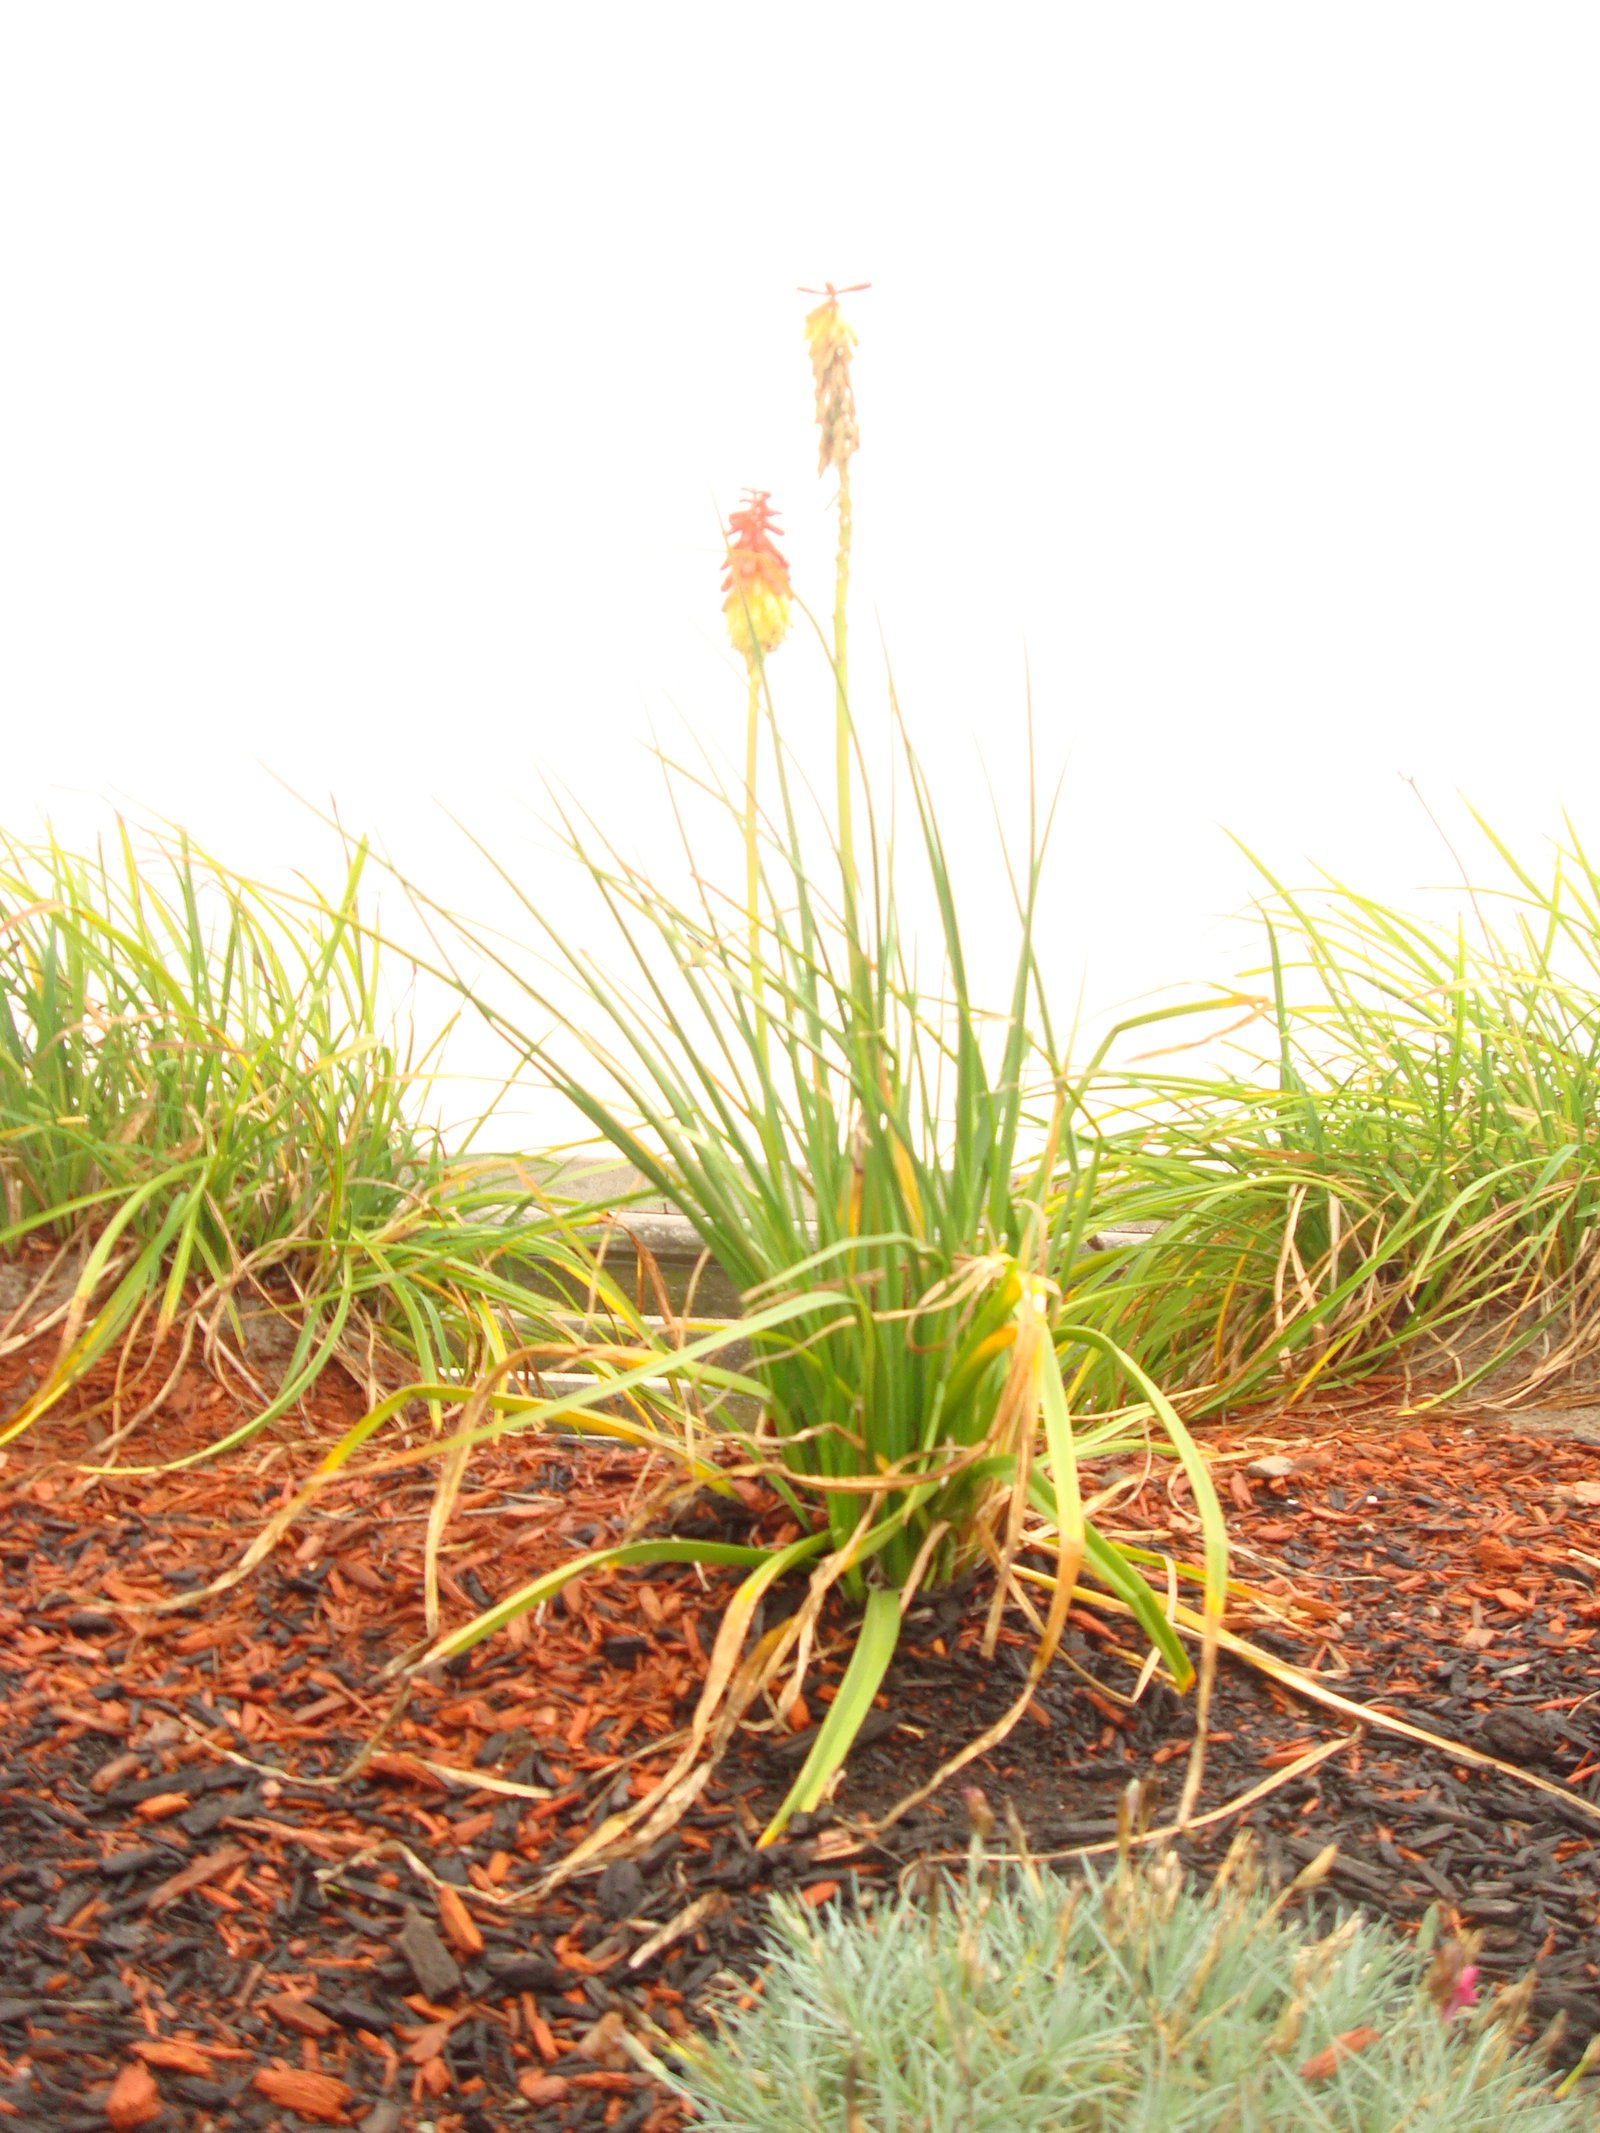 Revere beach plant